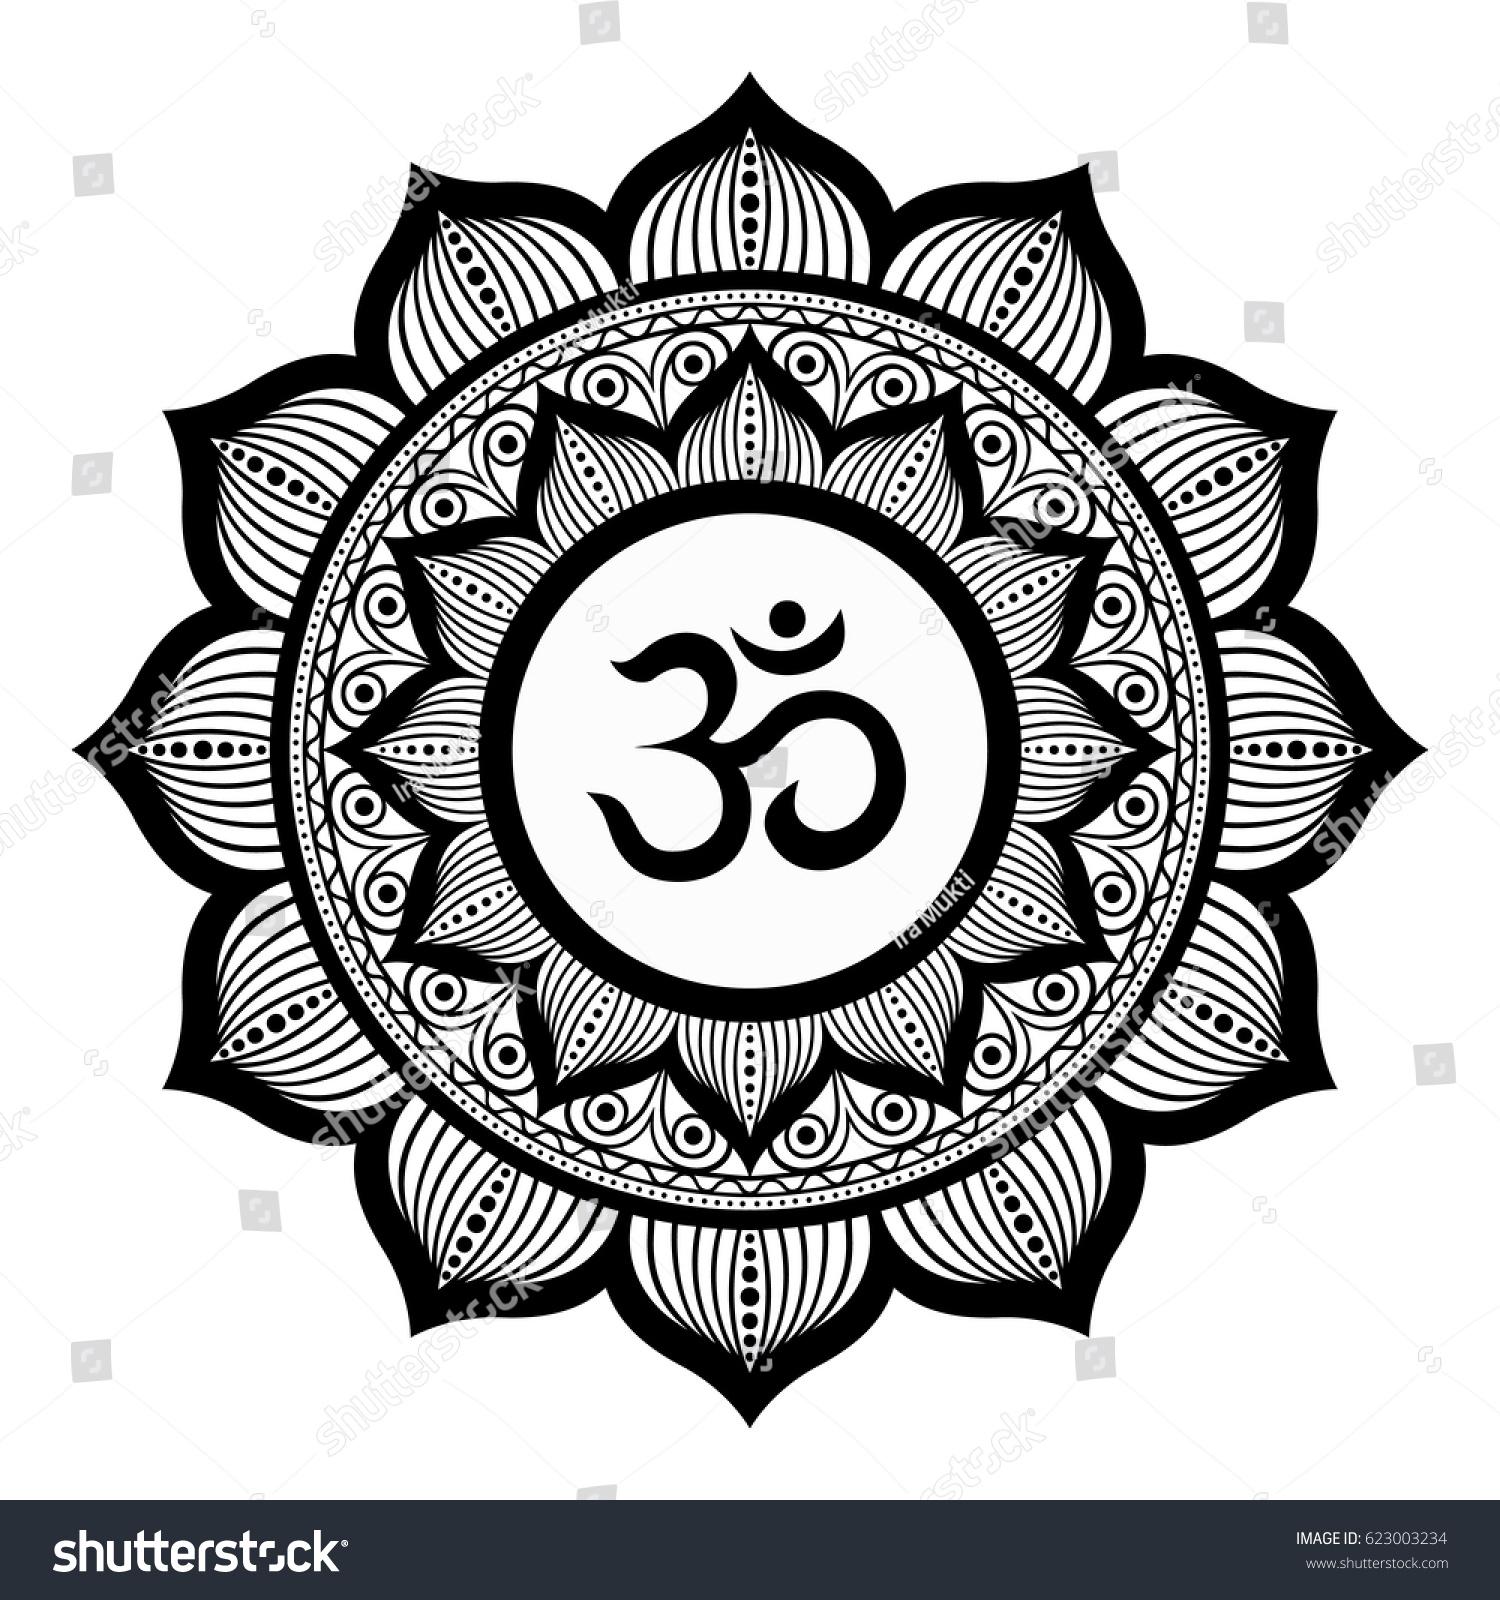 Om symbol ethnic mandala round ornament stock vector 623003234 om symbol ethnic mandala round ornament vector art buycottarizona